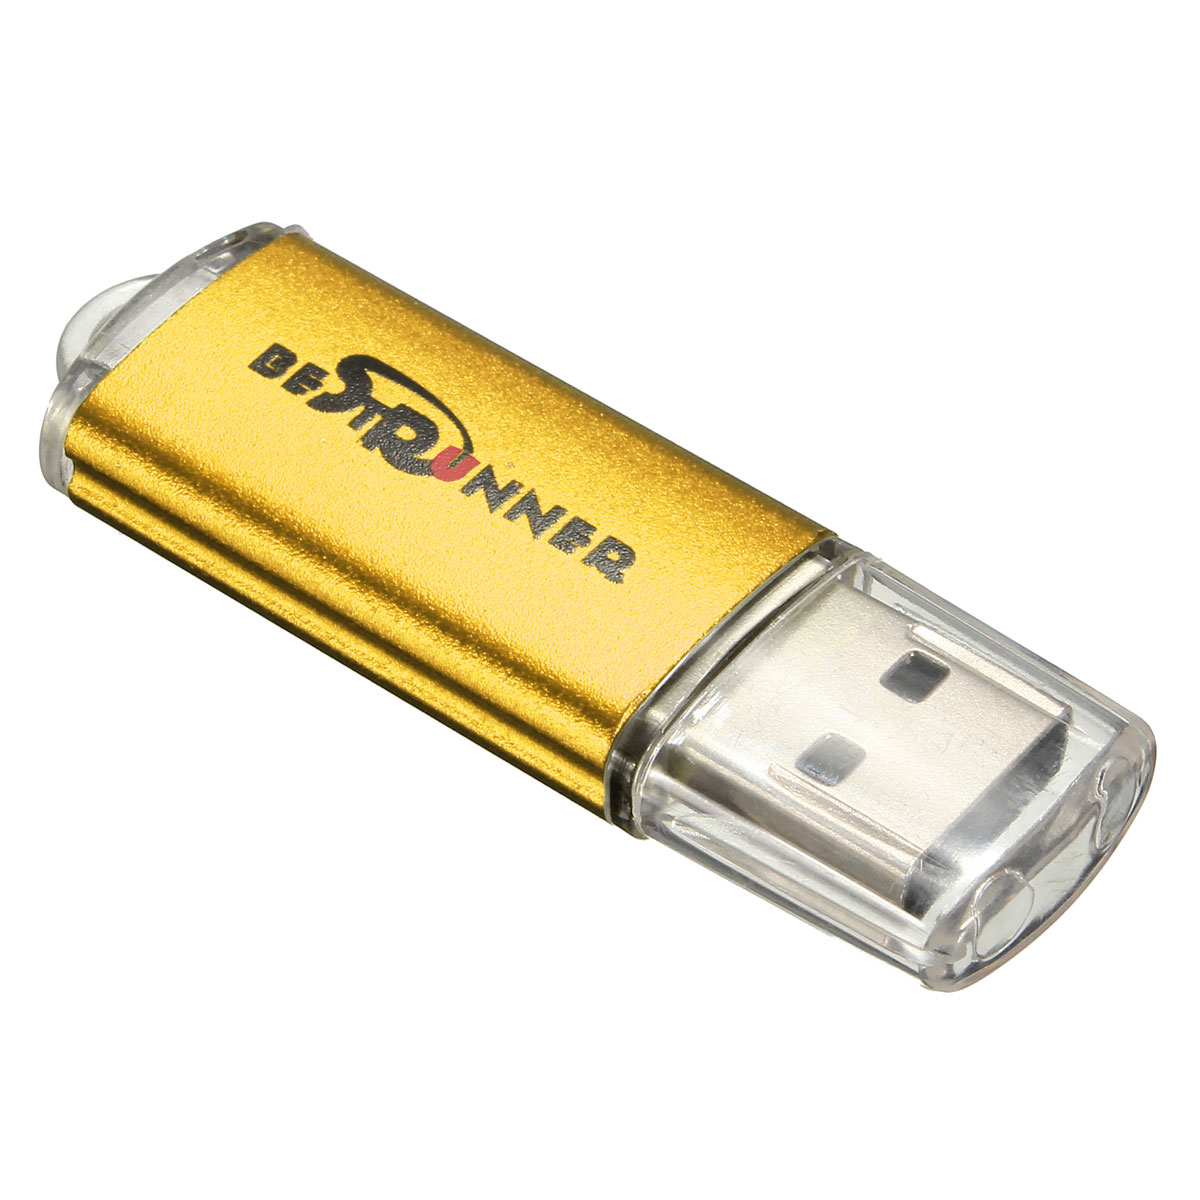 BESTRUNNER 32GB 32G B 2.0 Flash Memory Stick Drive Storage Thumb Pen U Disk